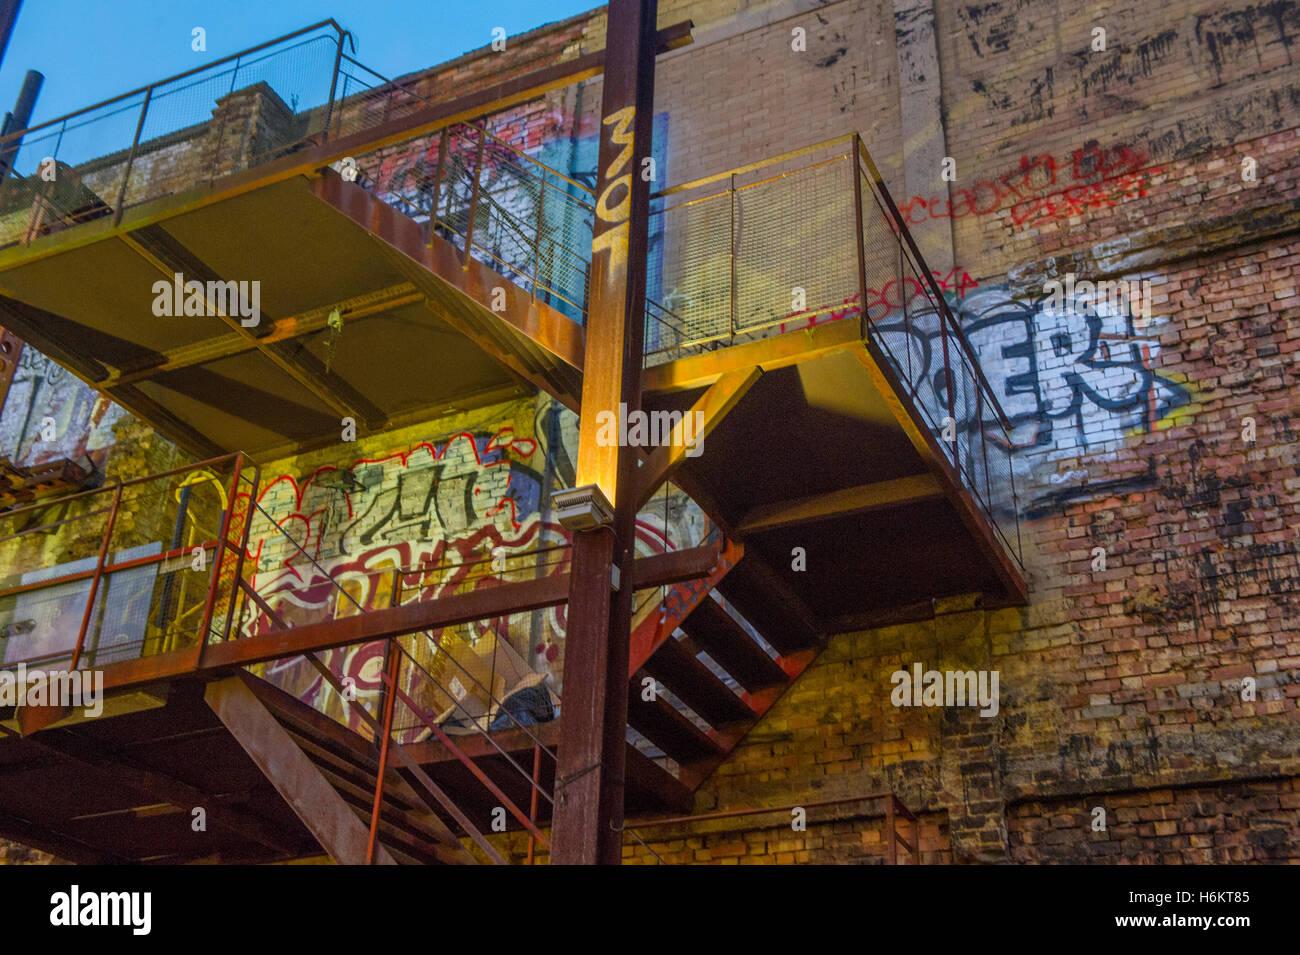 Graffiti and fire escape in a block of flats - Stock Image